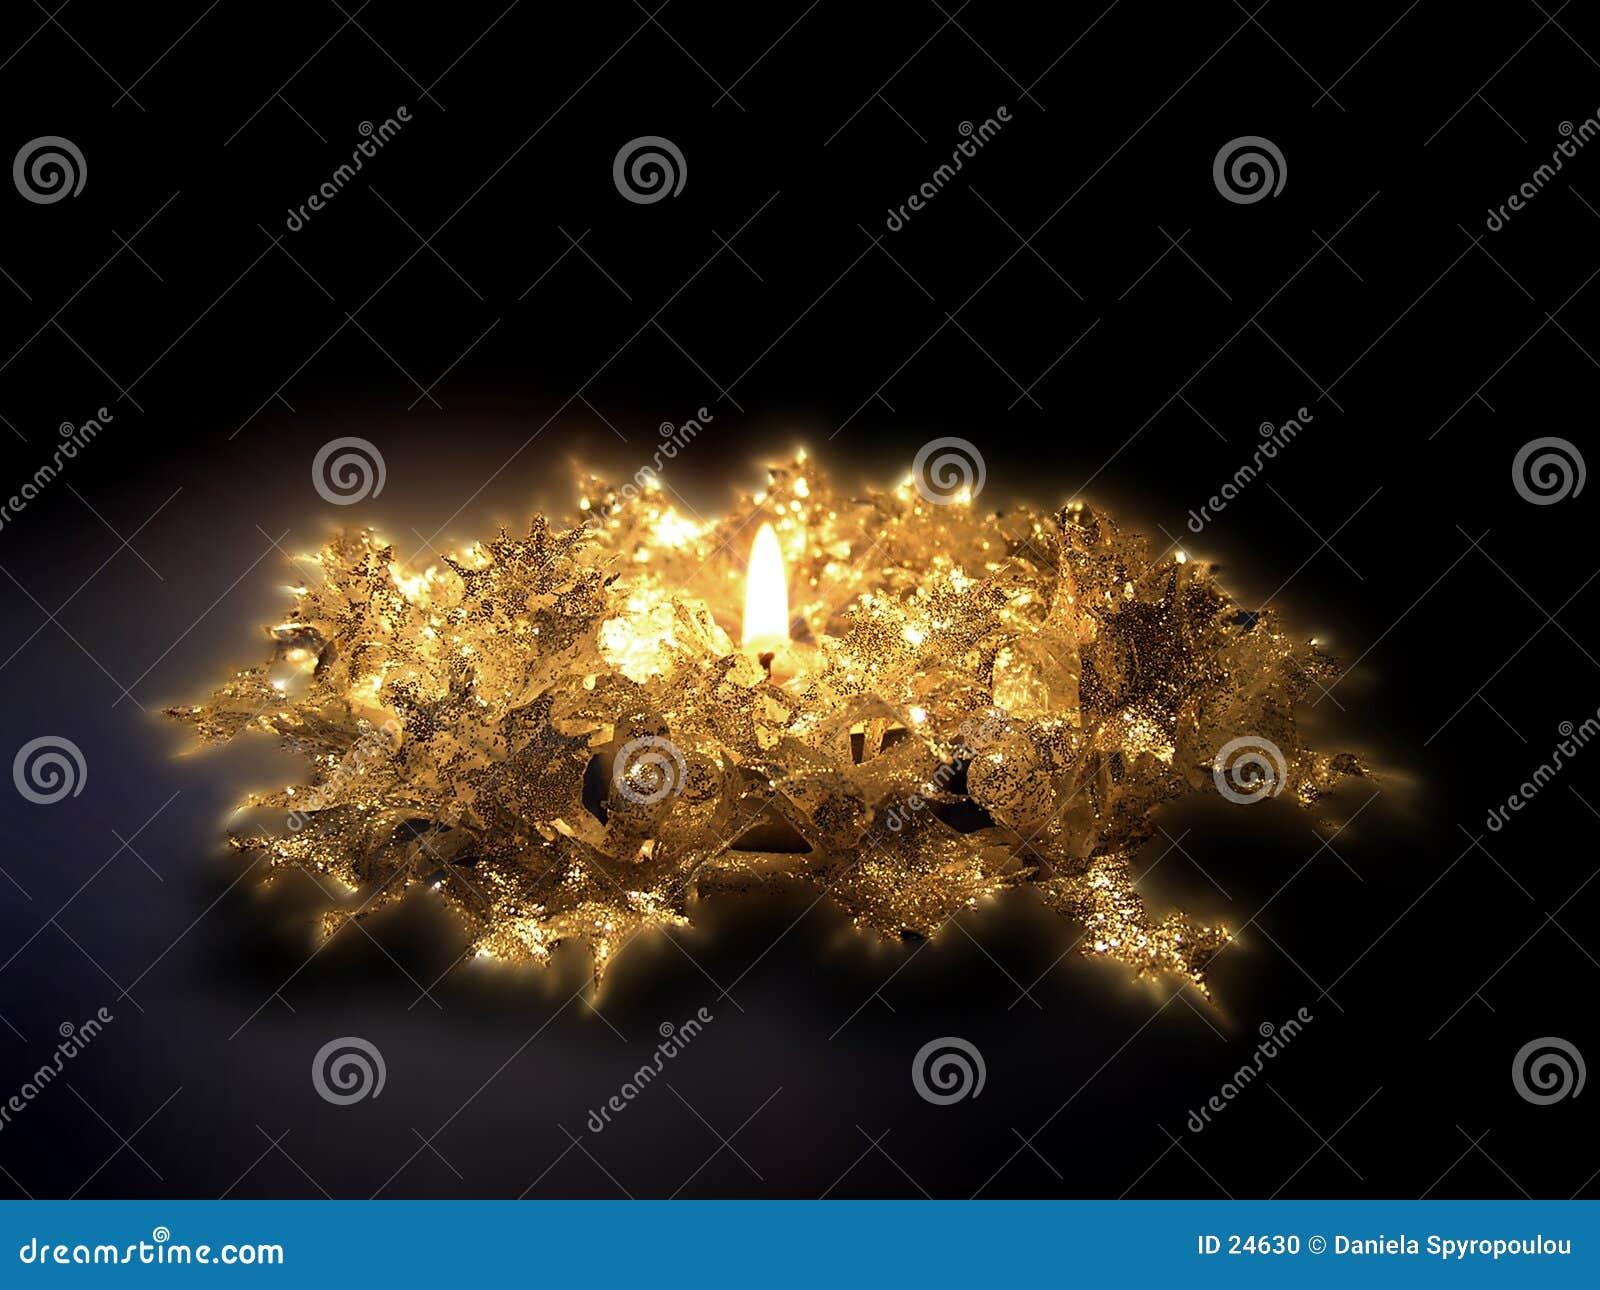 Download Bougie de Noël photo stock. Image du bougies, flammes, flamme - 24630